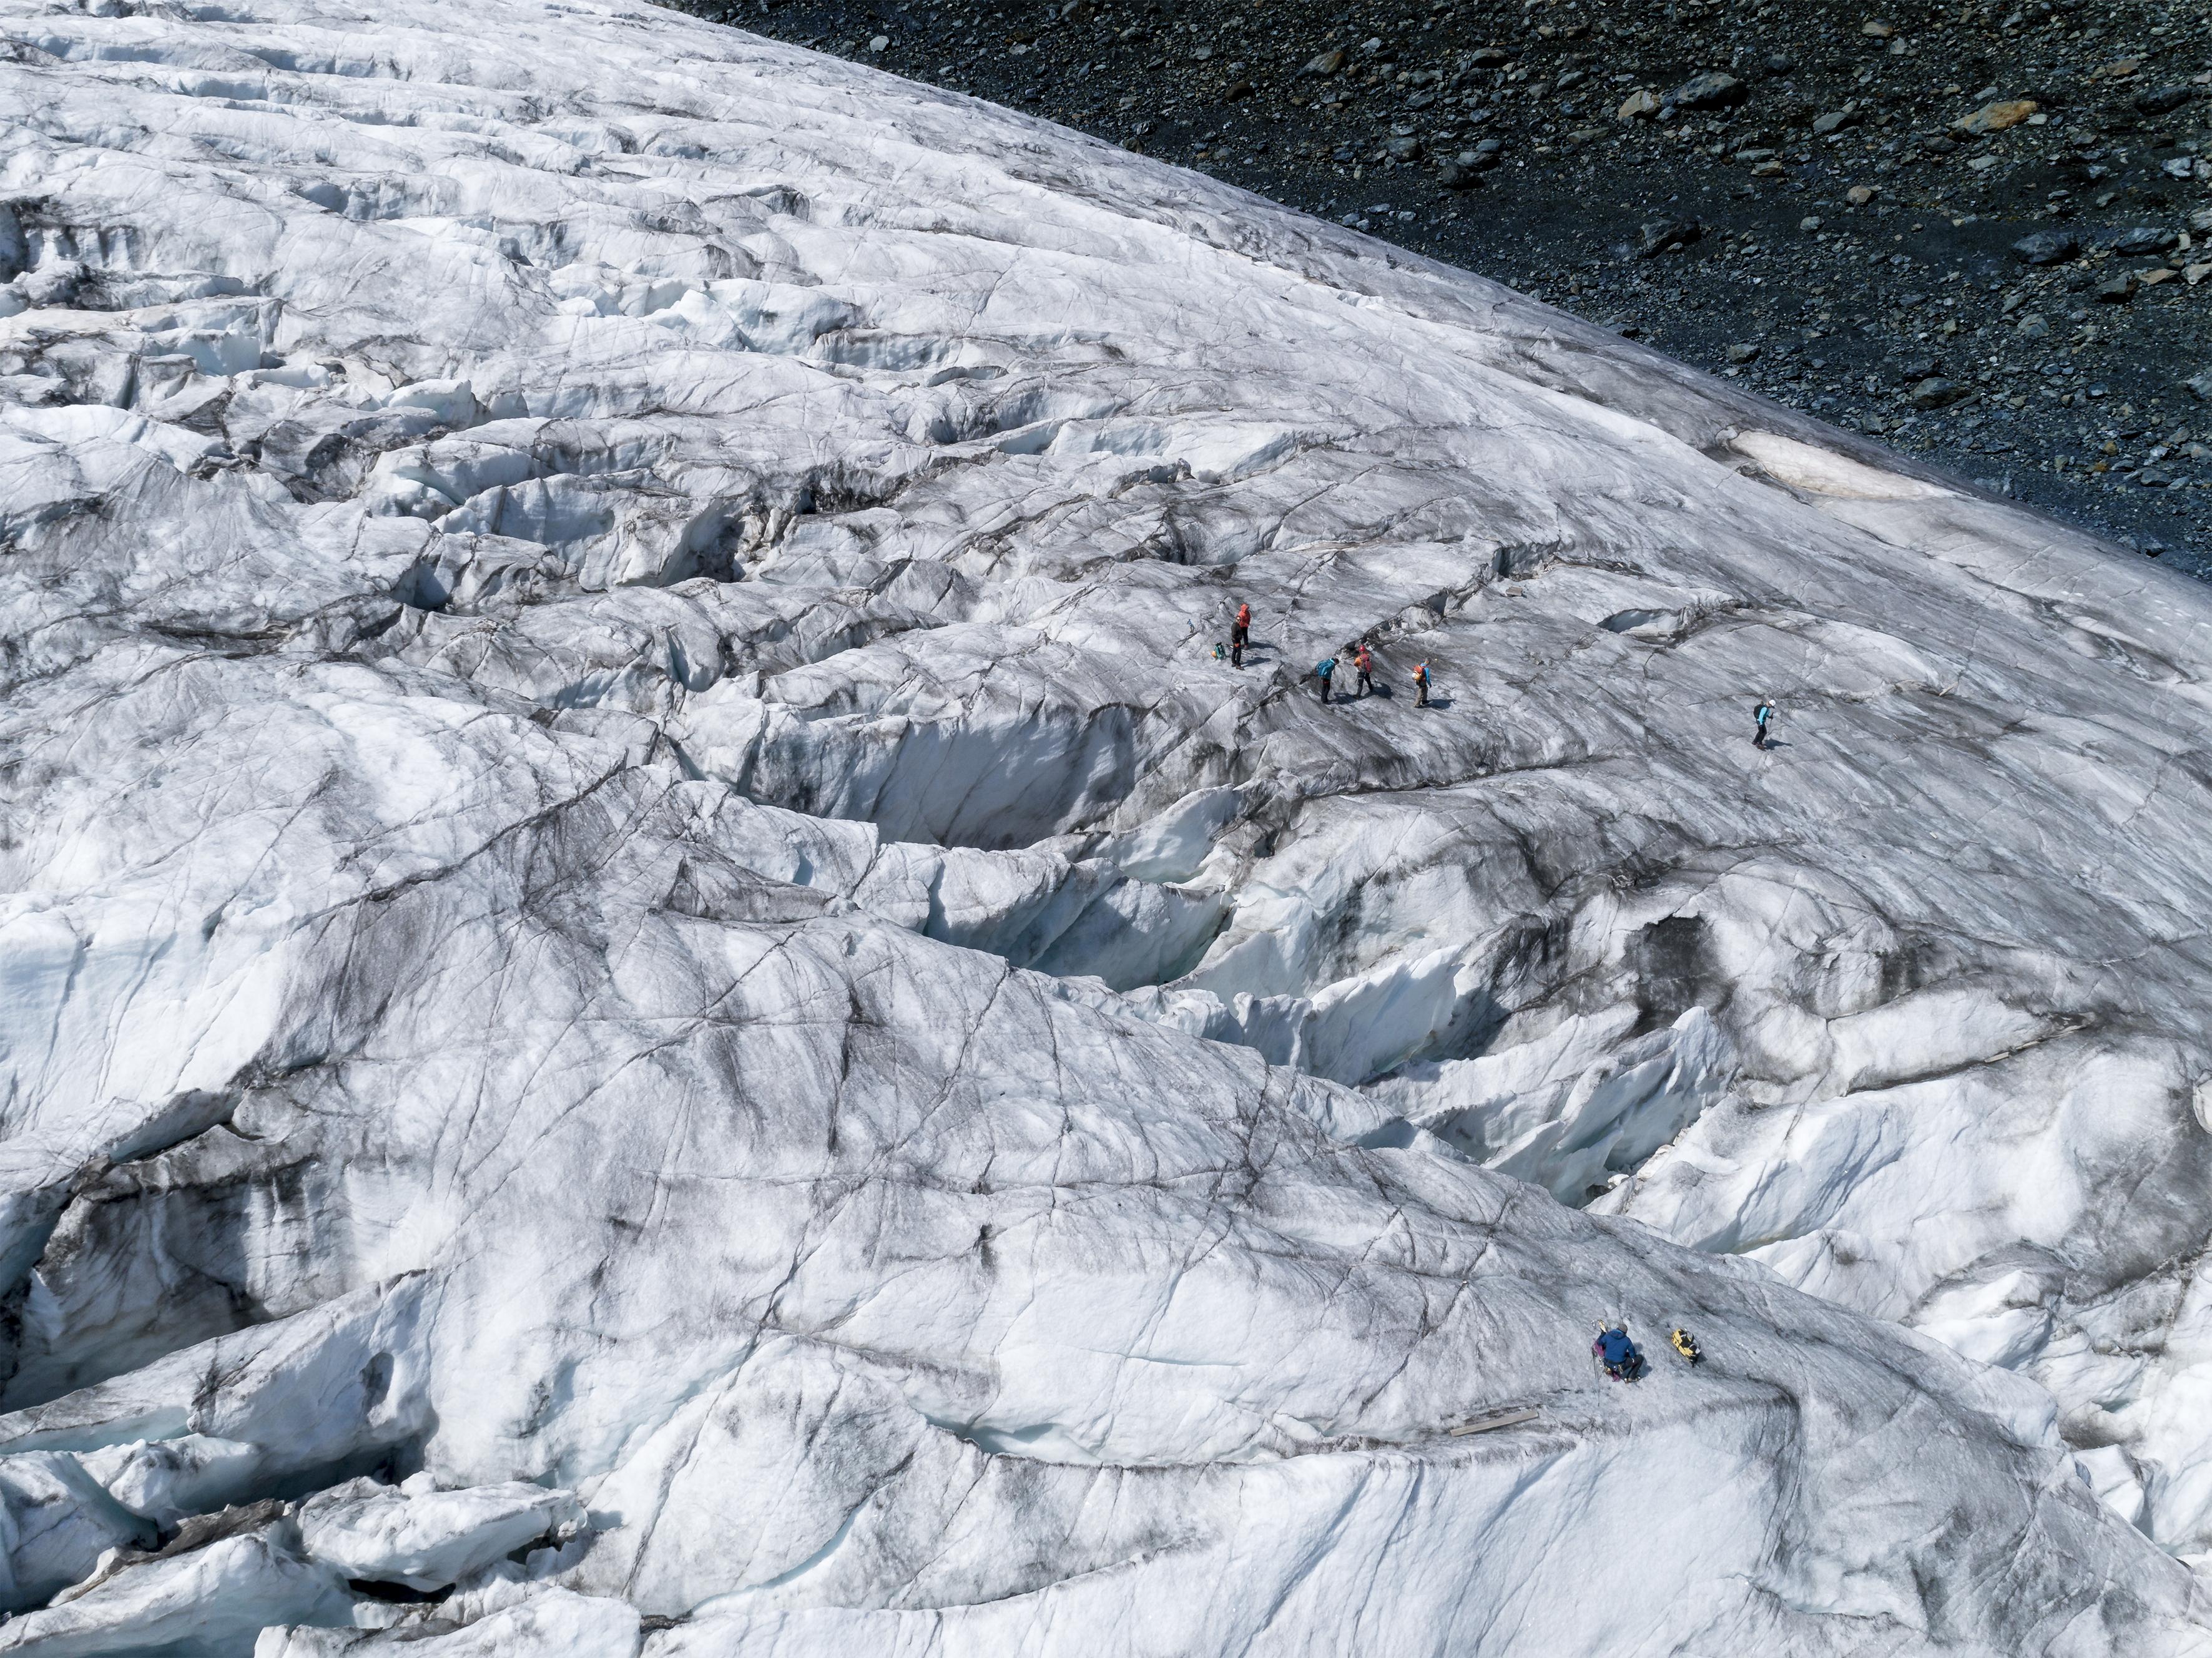 #395 Glaciers,Unterer-Theodulgletscher, 2018, 45°57'45.335″N 7°43'53.322″E